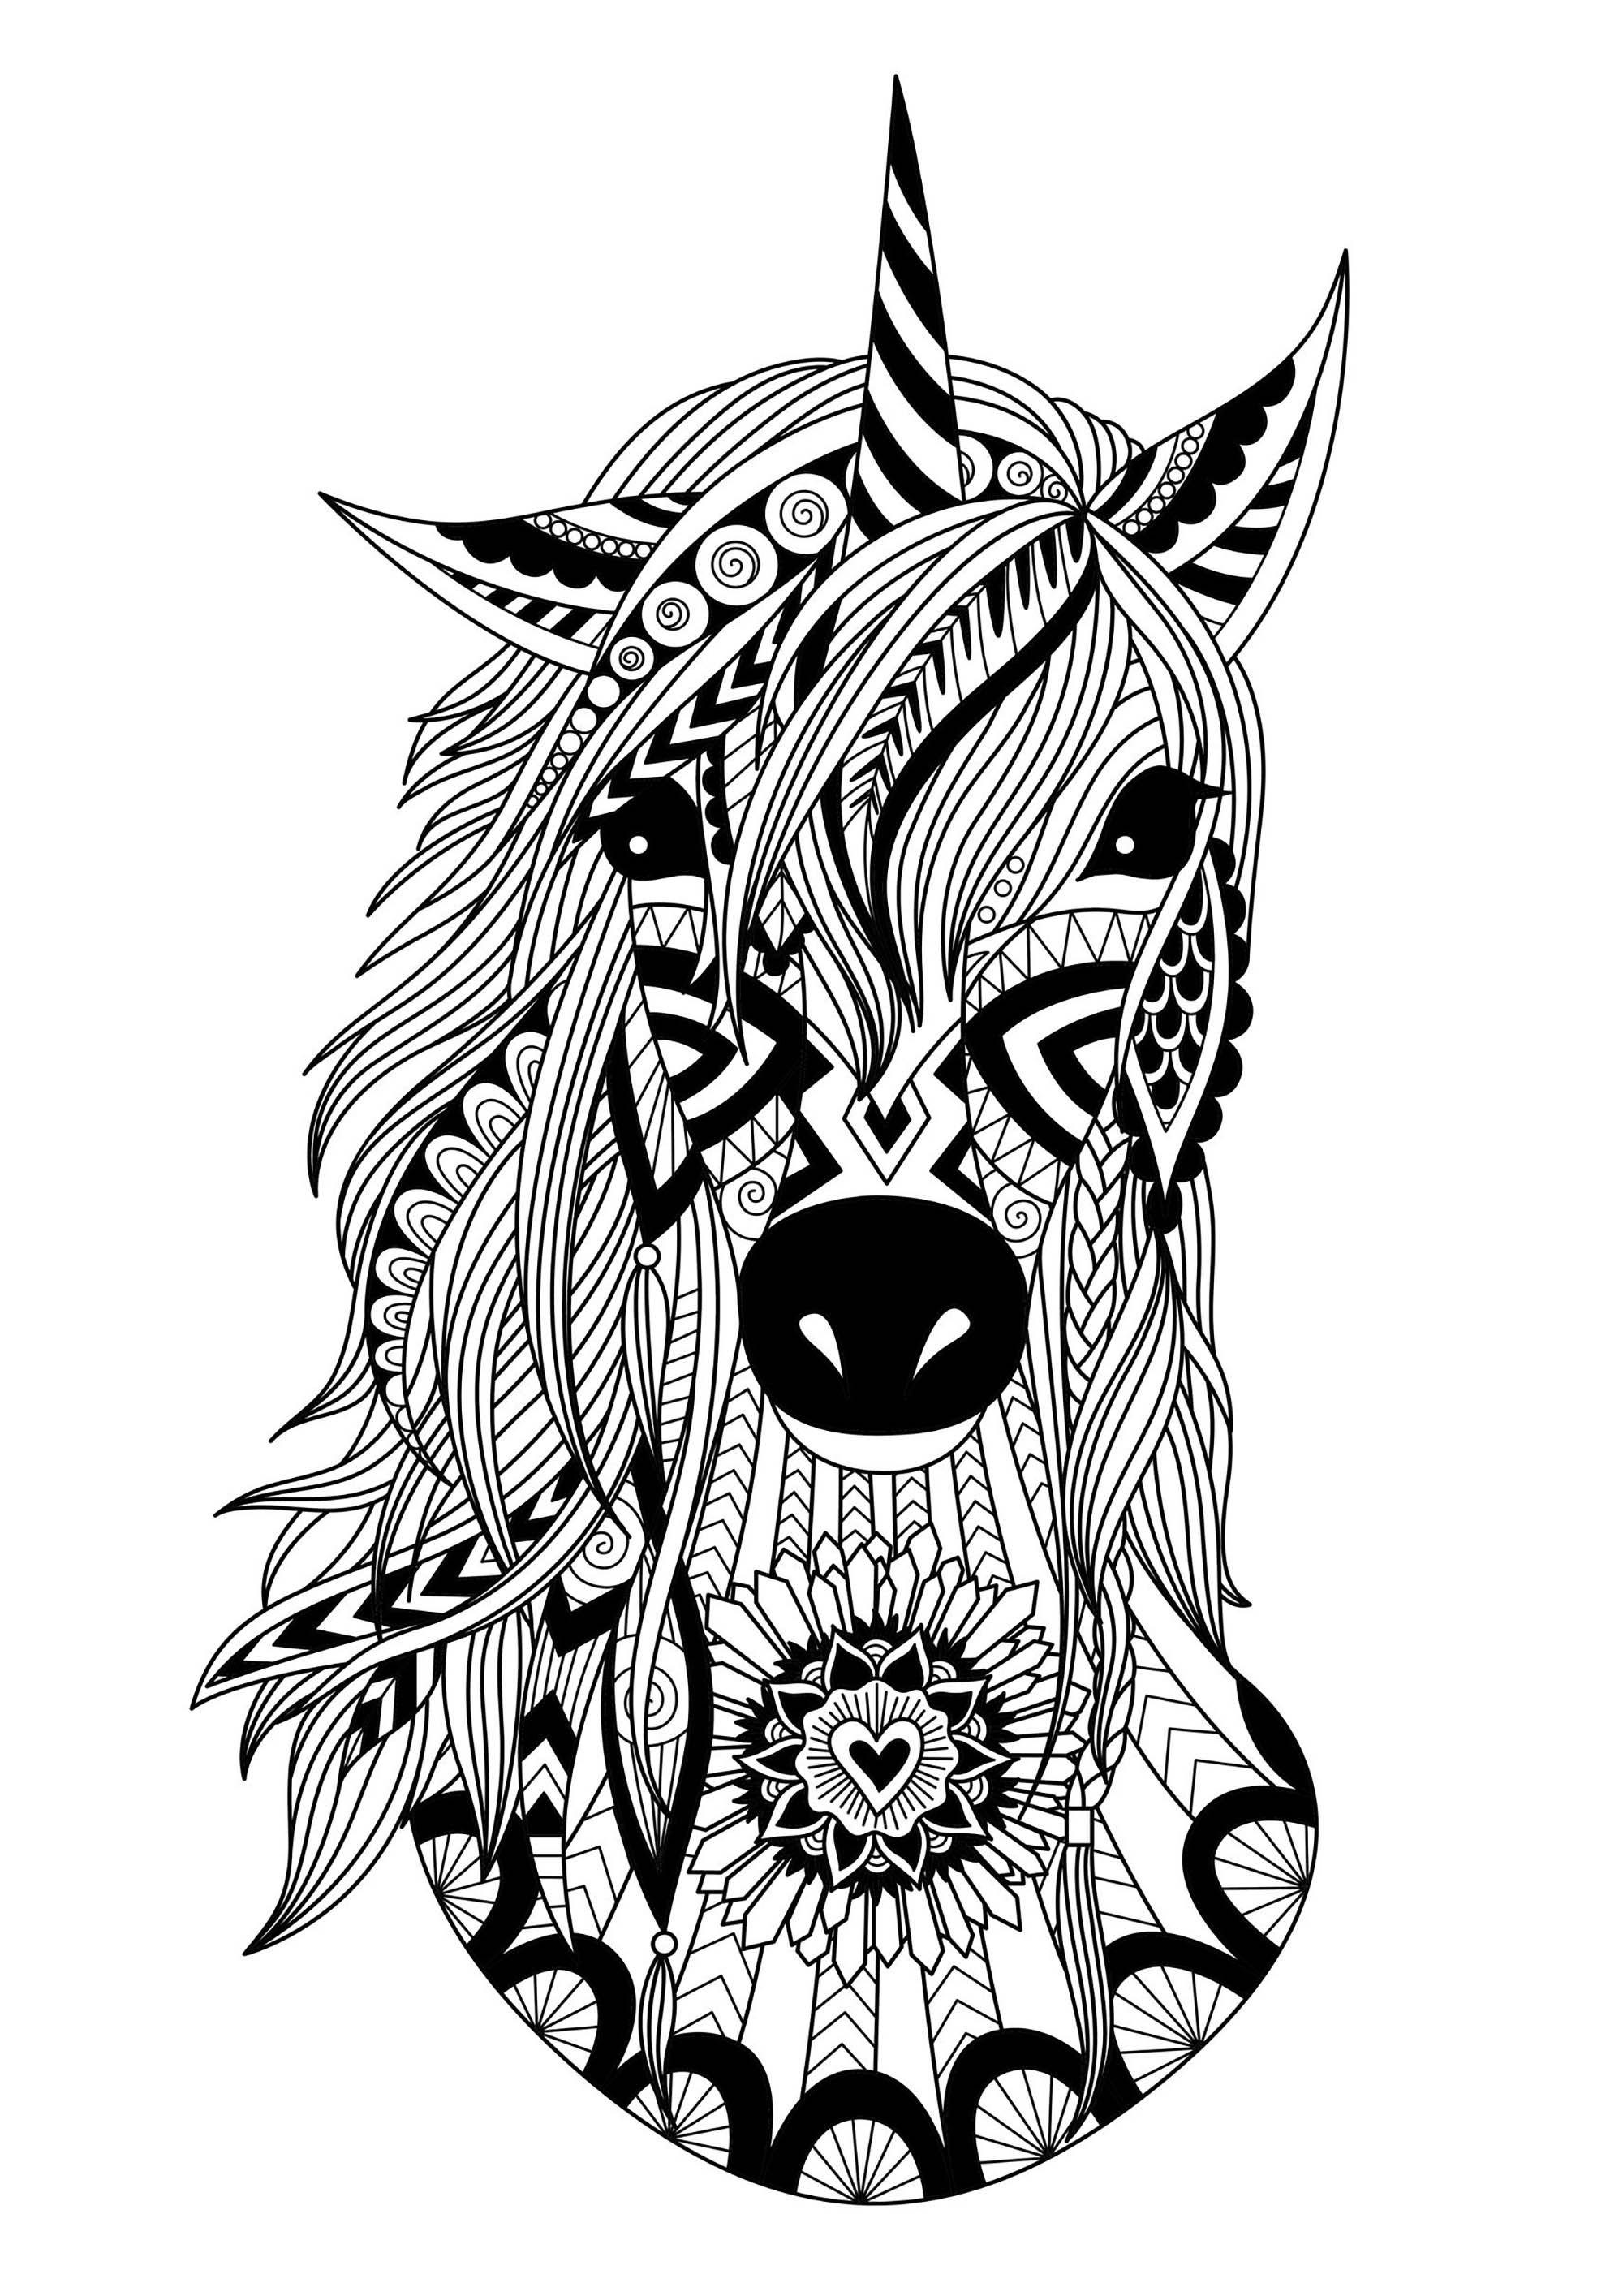 Pin By Angela Shelden On Mandalas In 2020 Animal Tattoo Animals